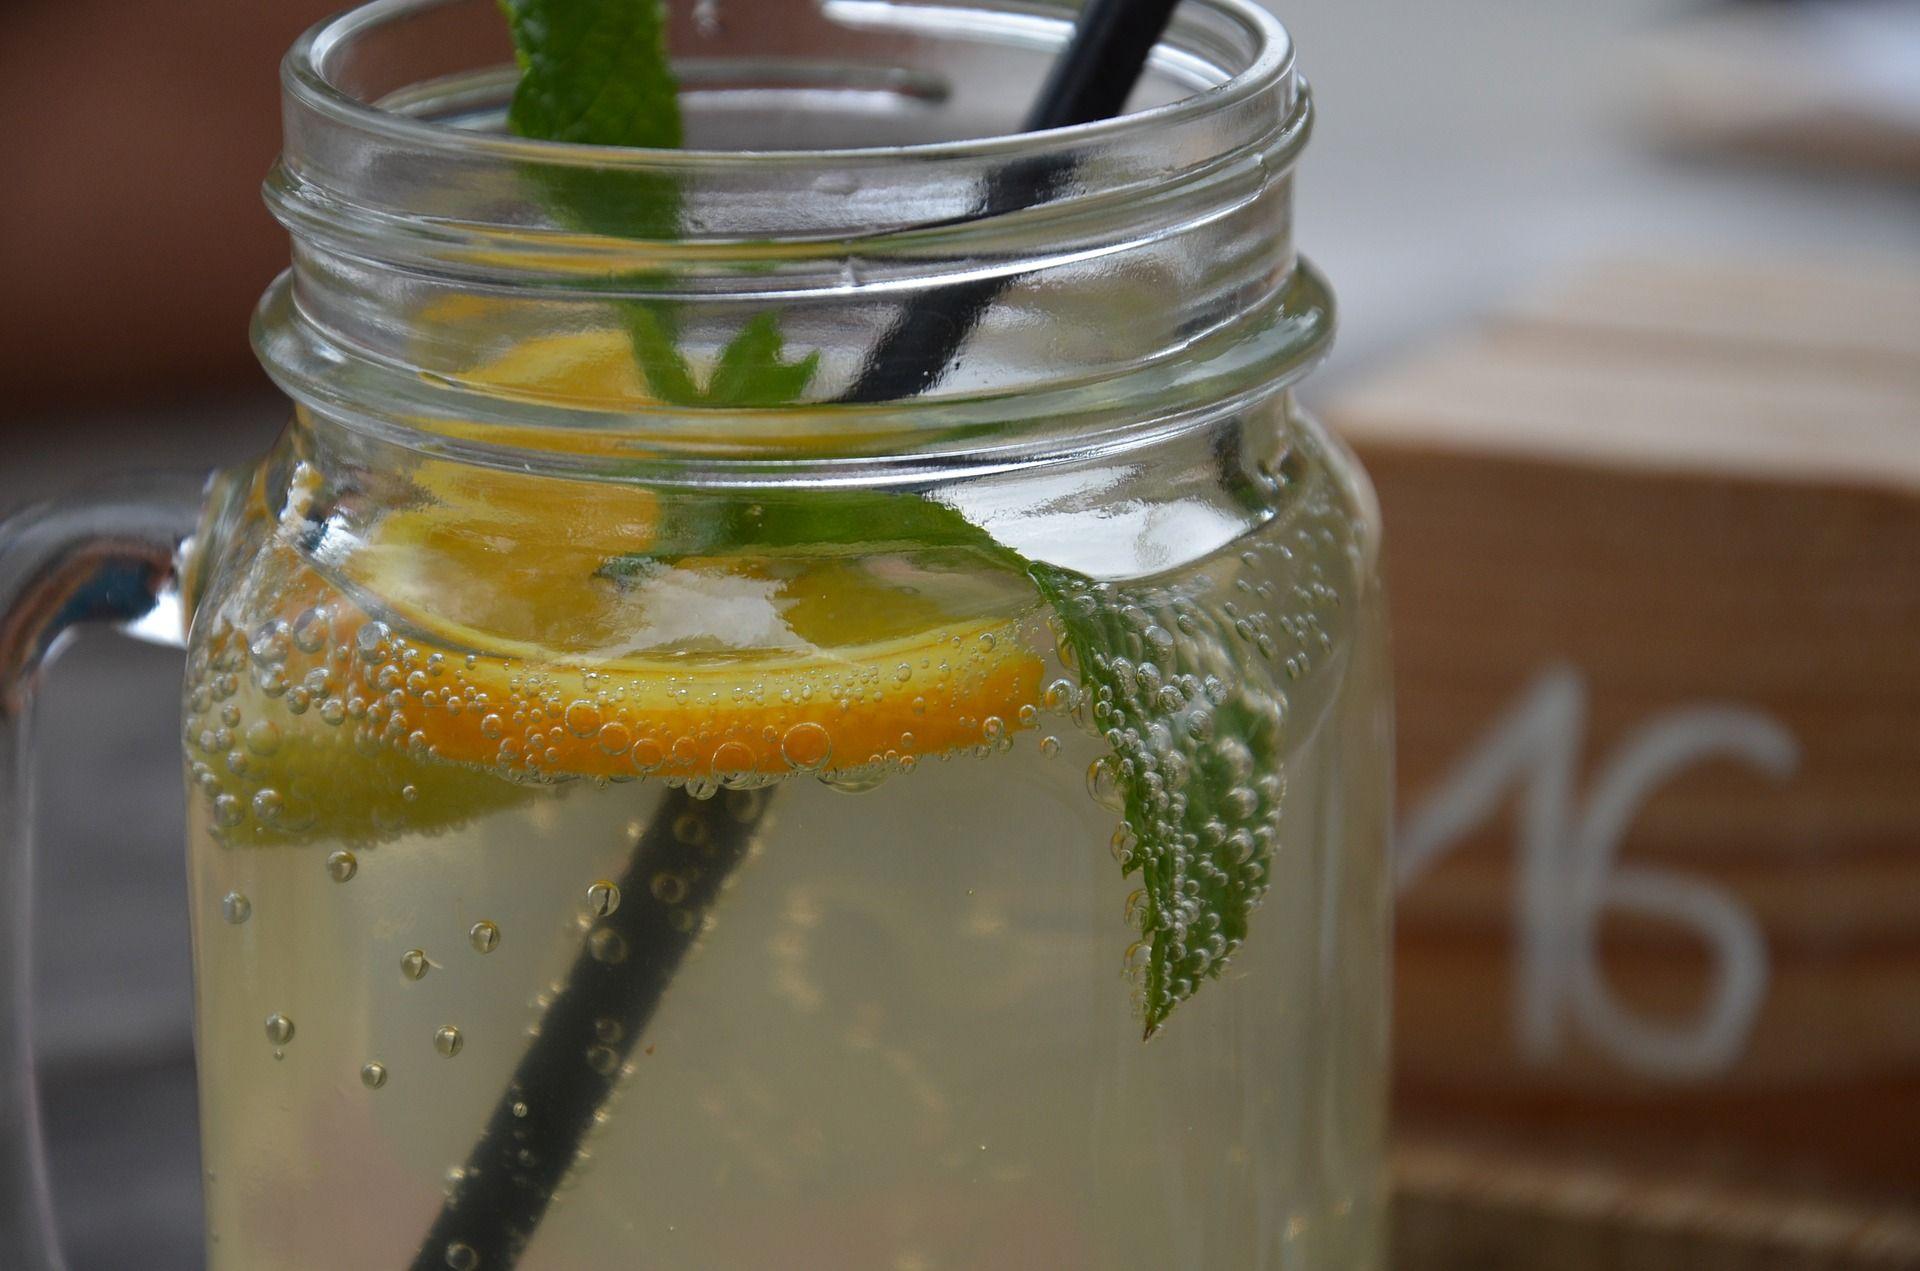 Lemonade/pixabay